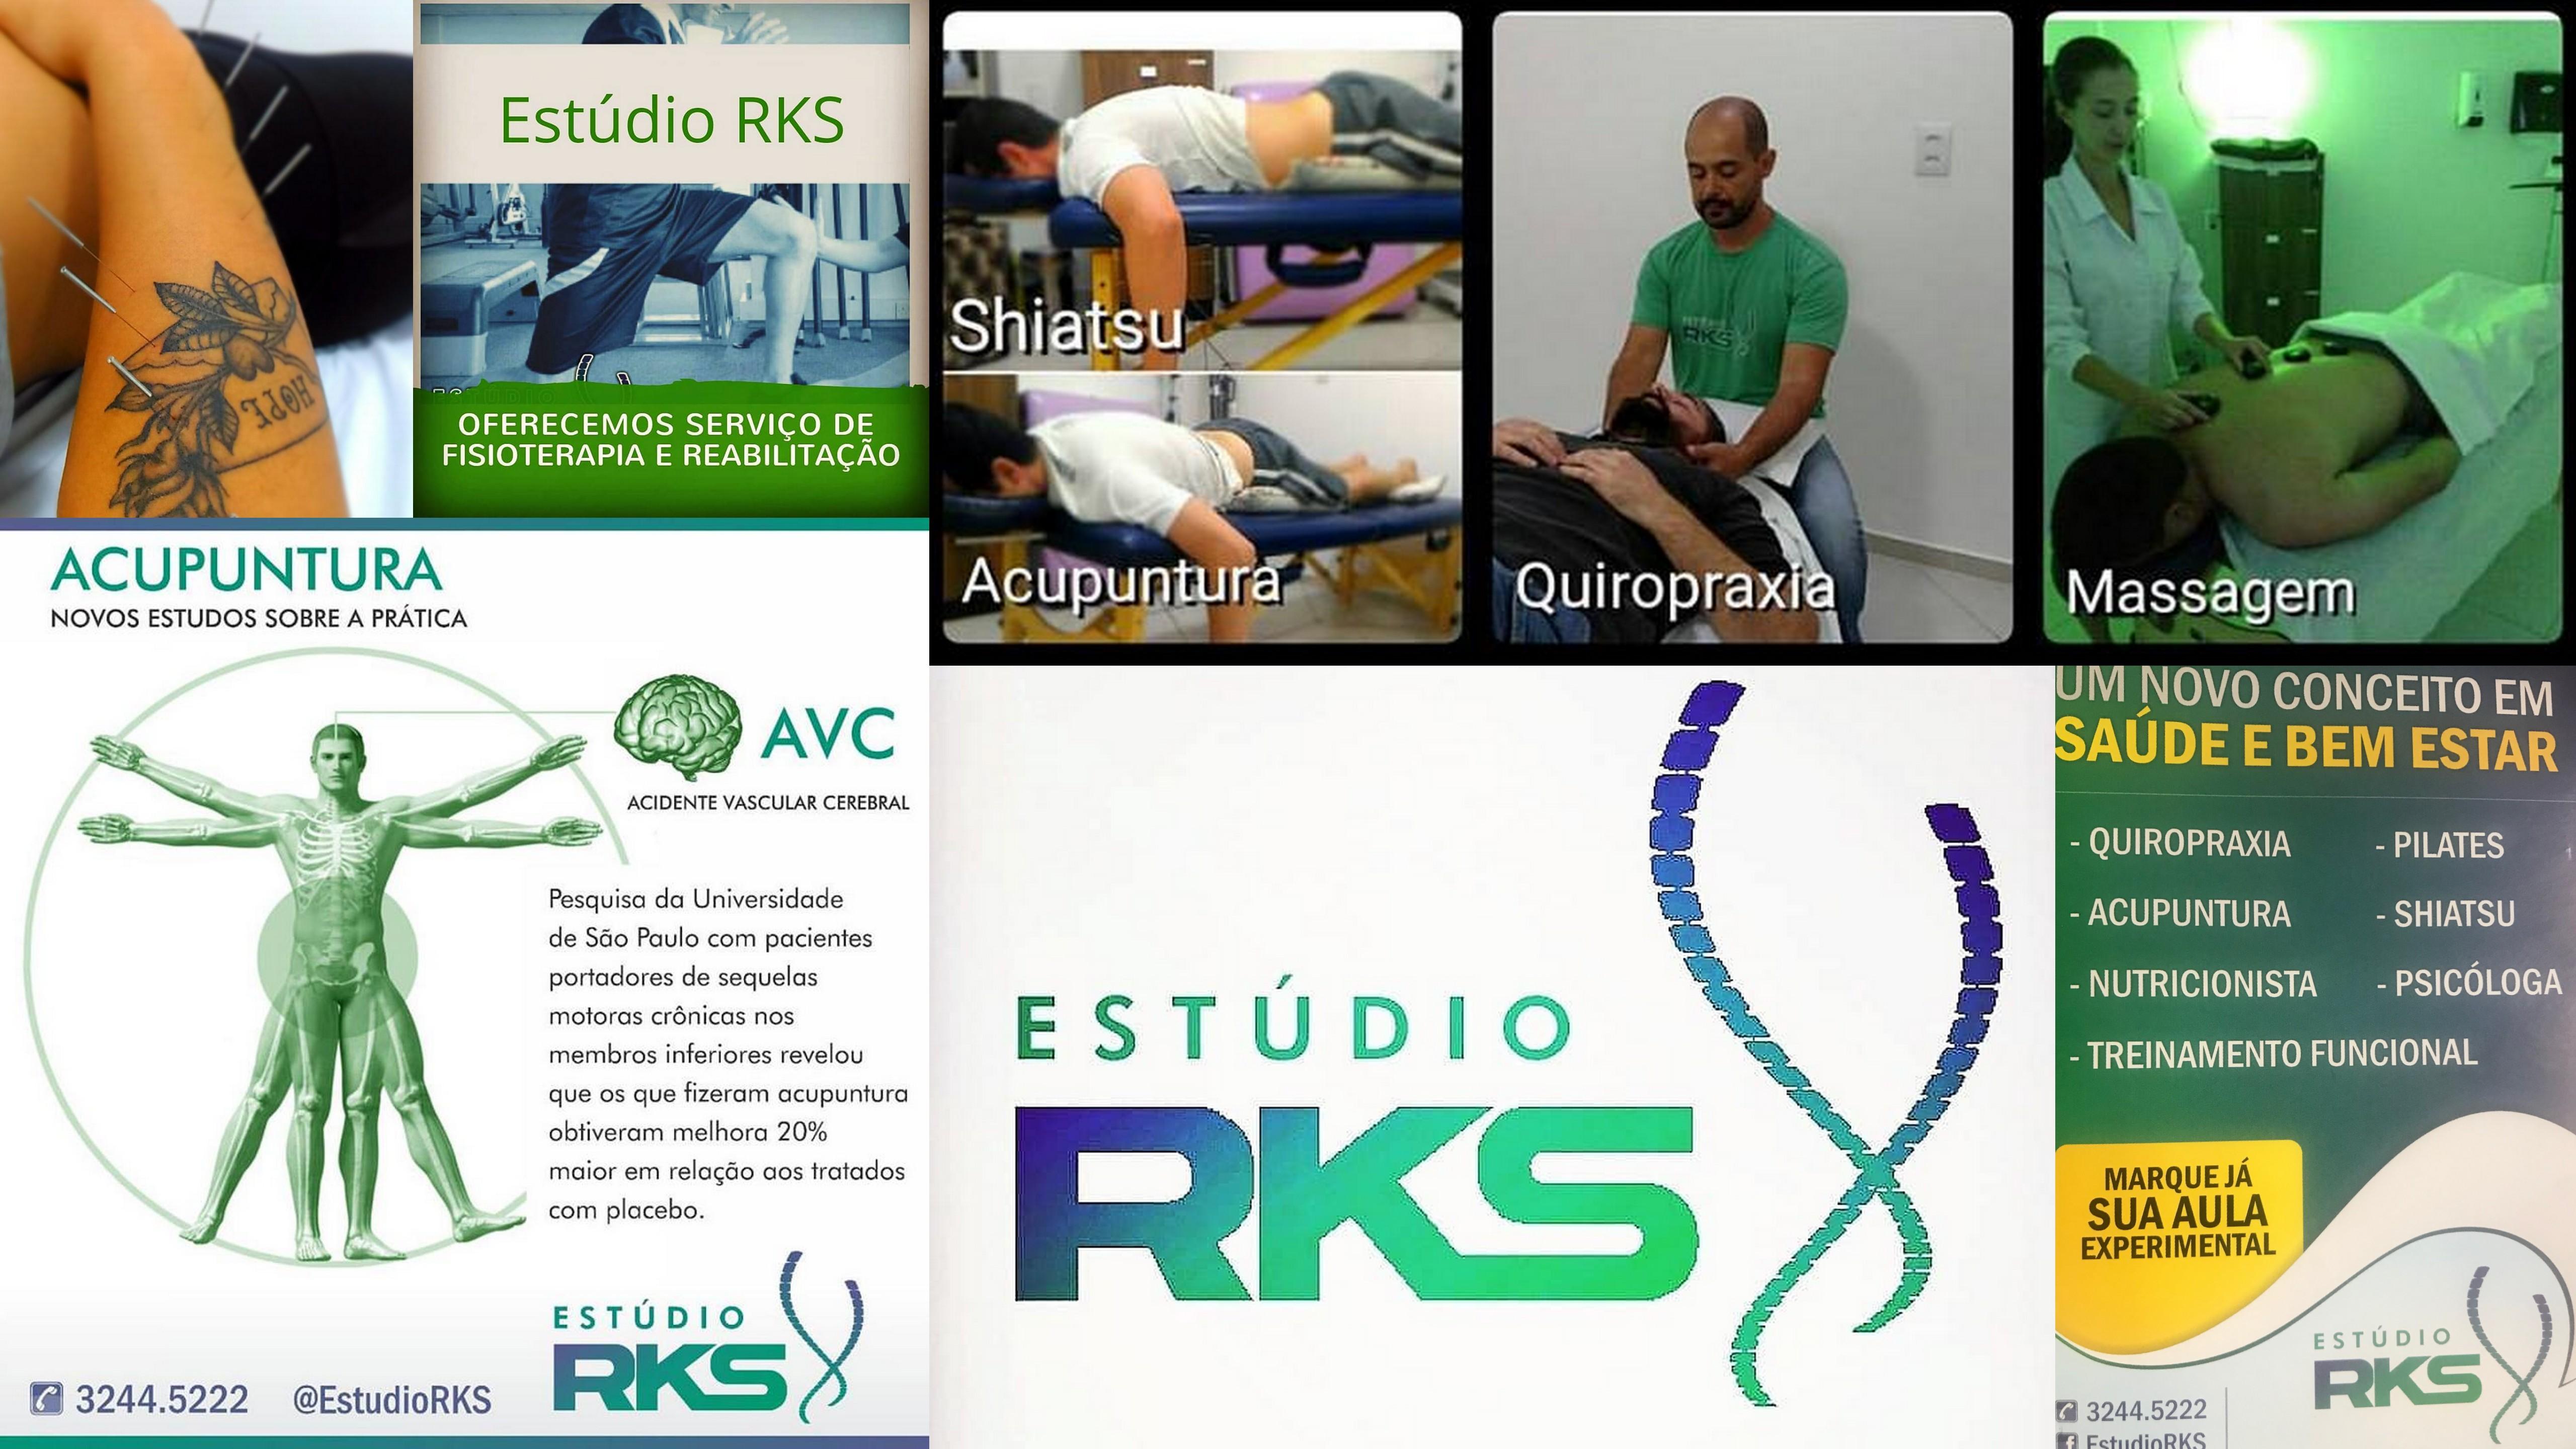 Estúdio RKS - turismoonline.net.br